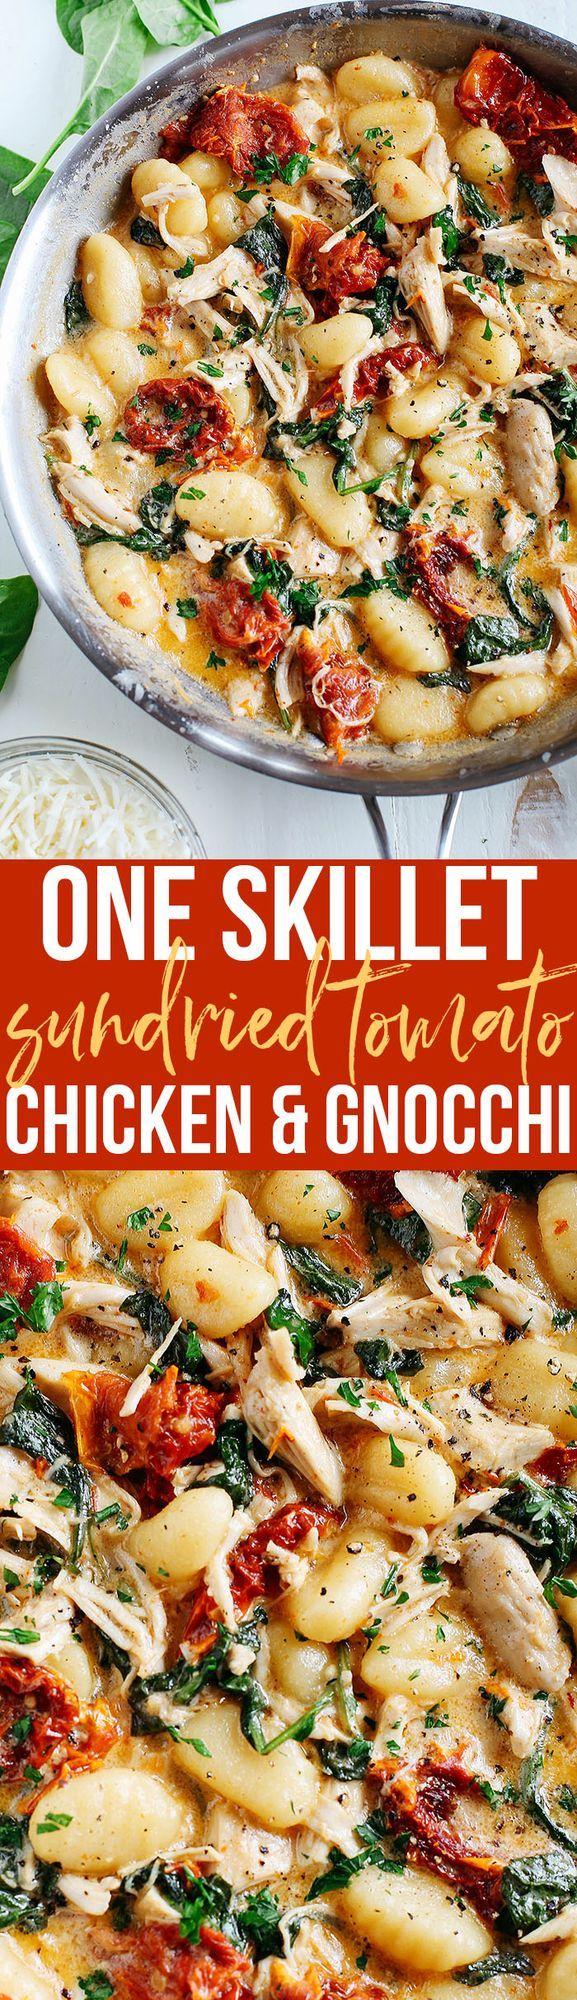 One Skillet Sun Dried Tomato Chicken & Gnocchi   Eat Yourself Skinny   Bloglovin'